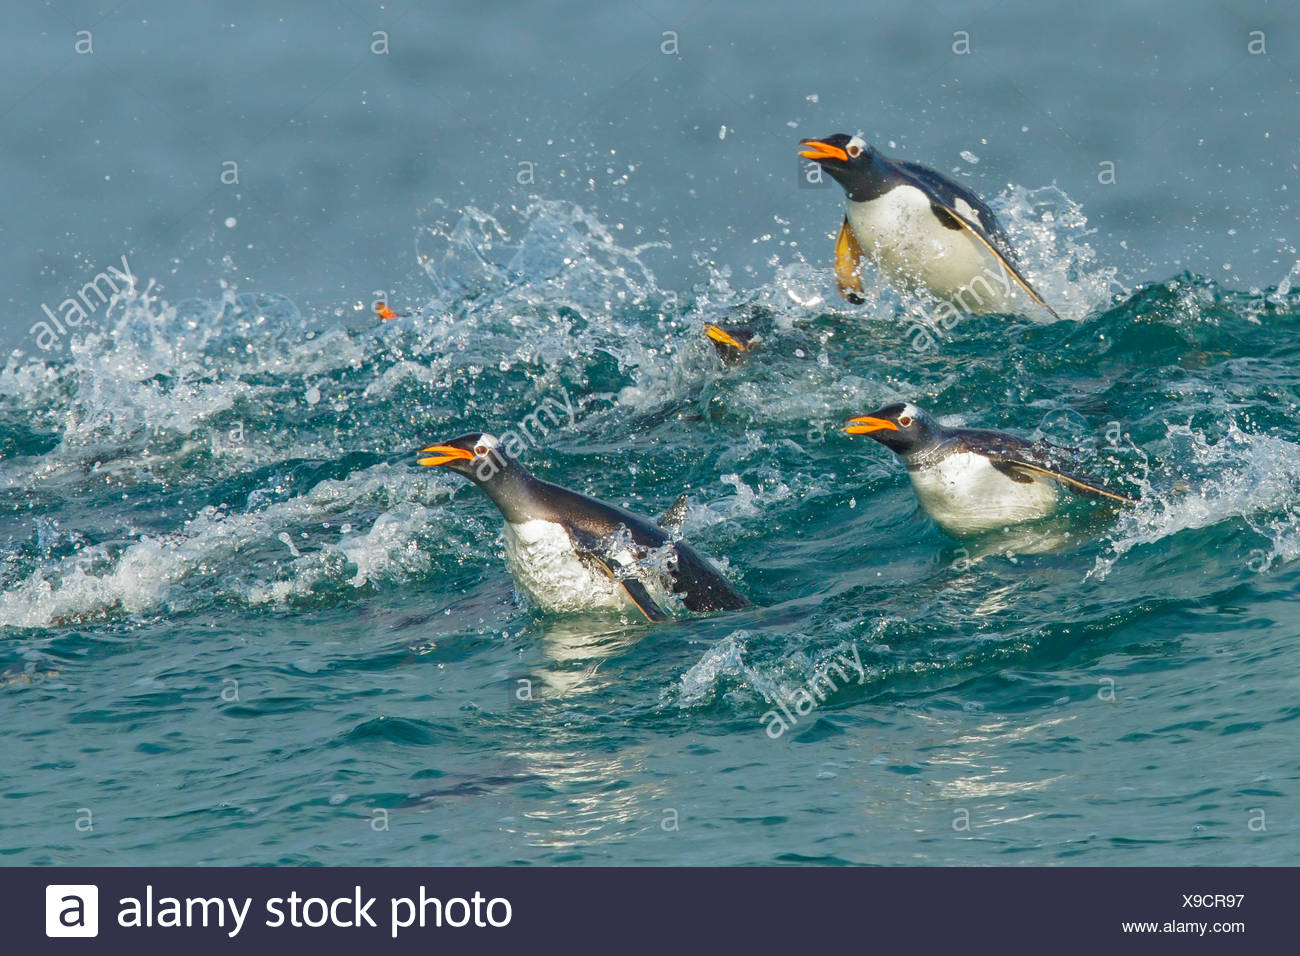 Gentoo Penguin (Pygoscelis papua) returning to land through the waves in the Falkland Islands. - Stock Image